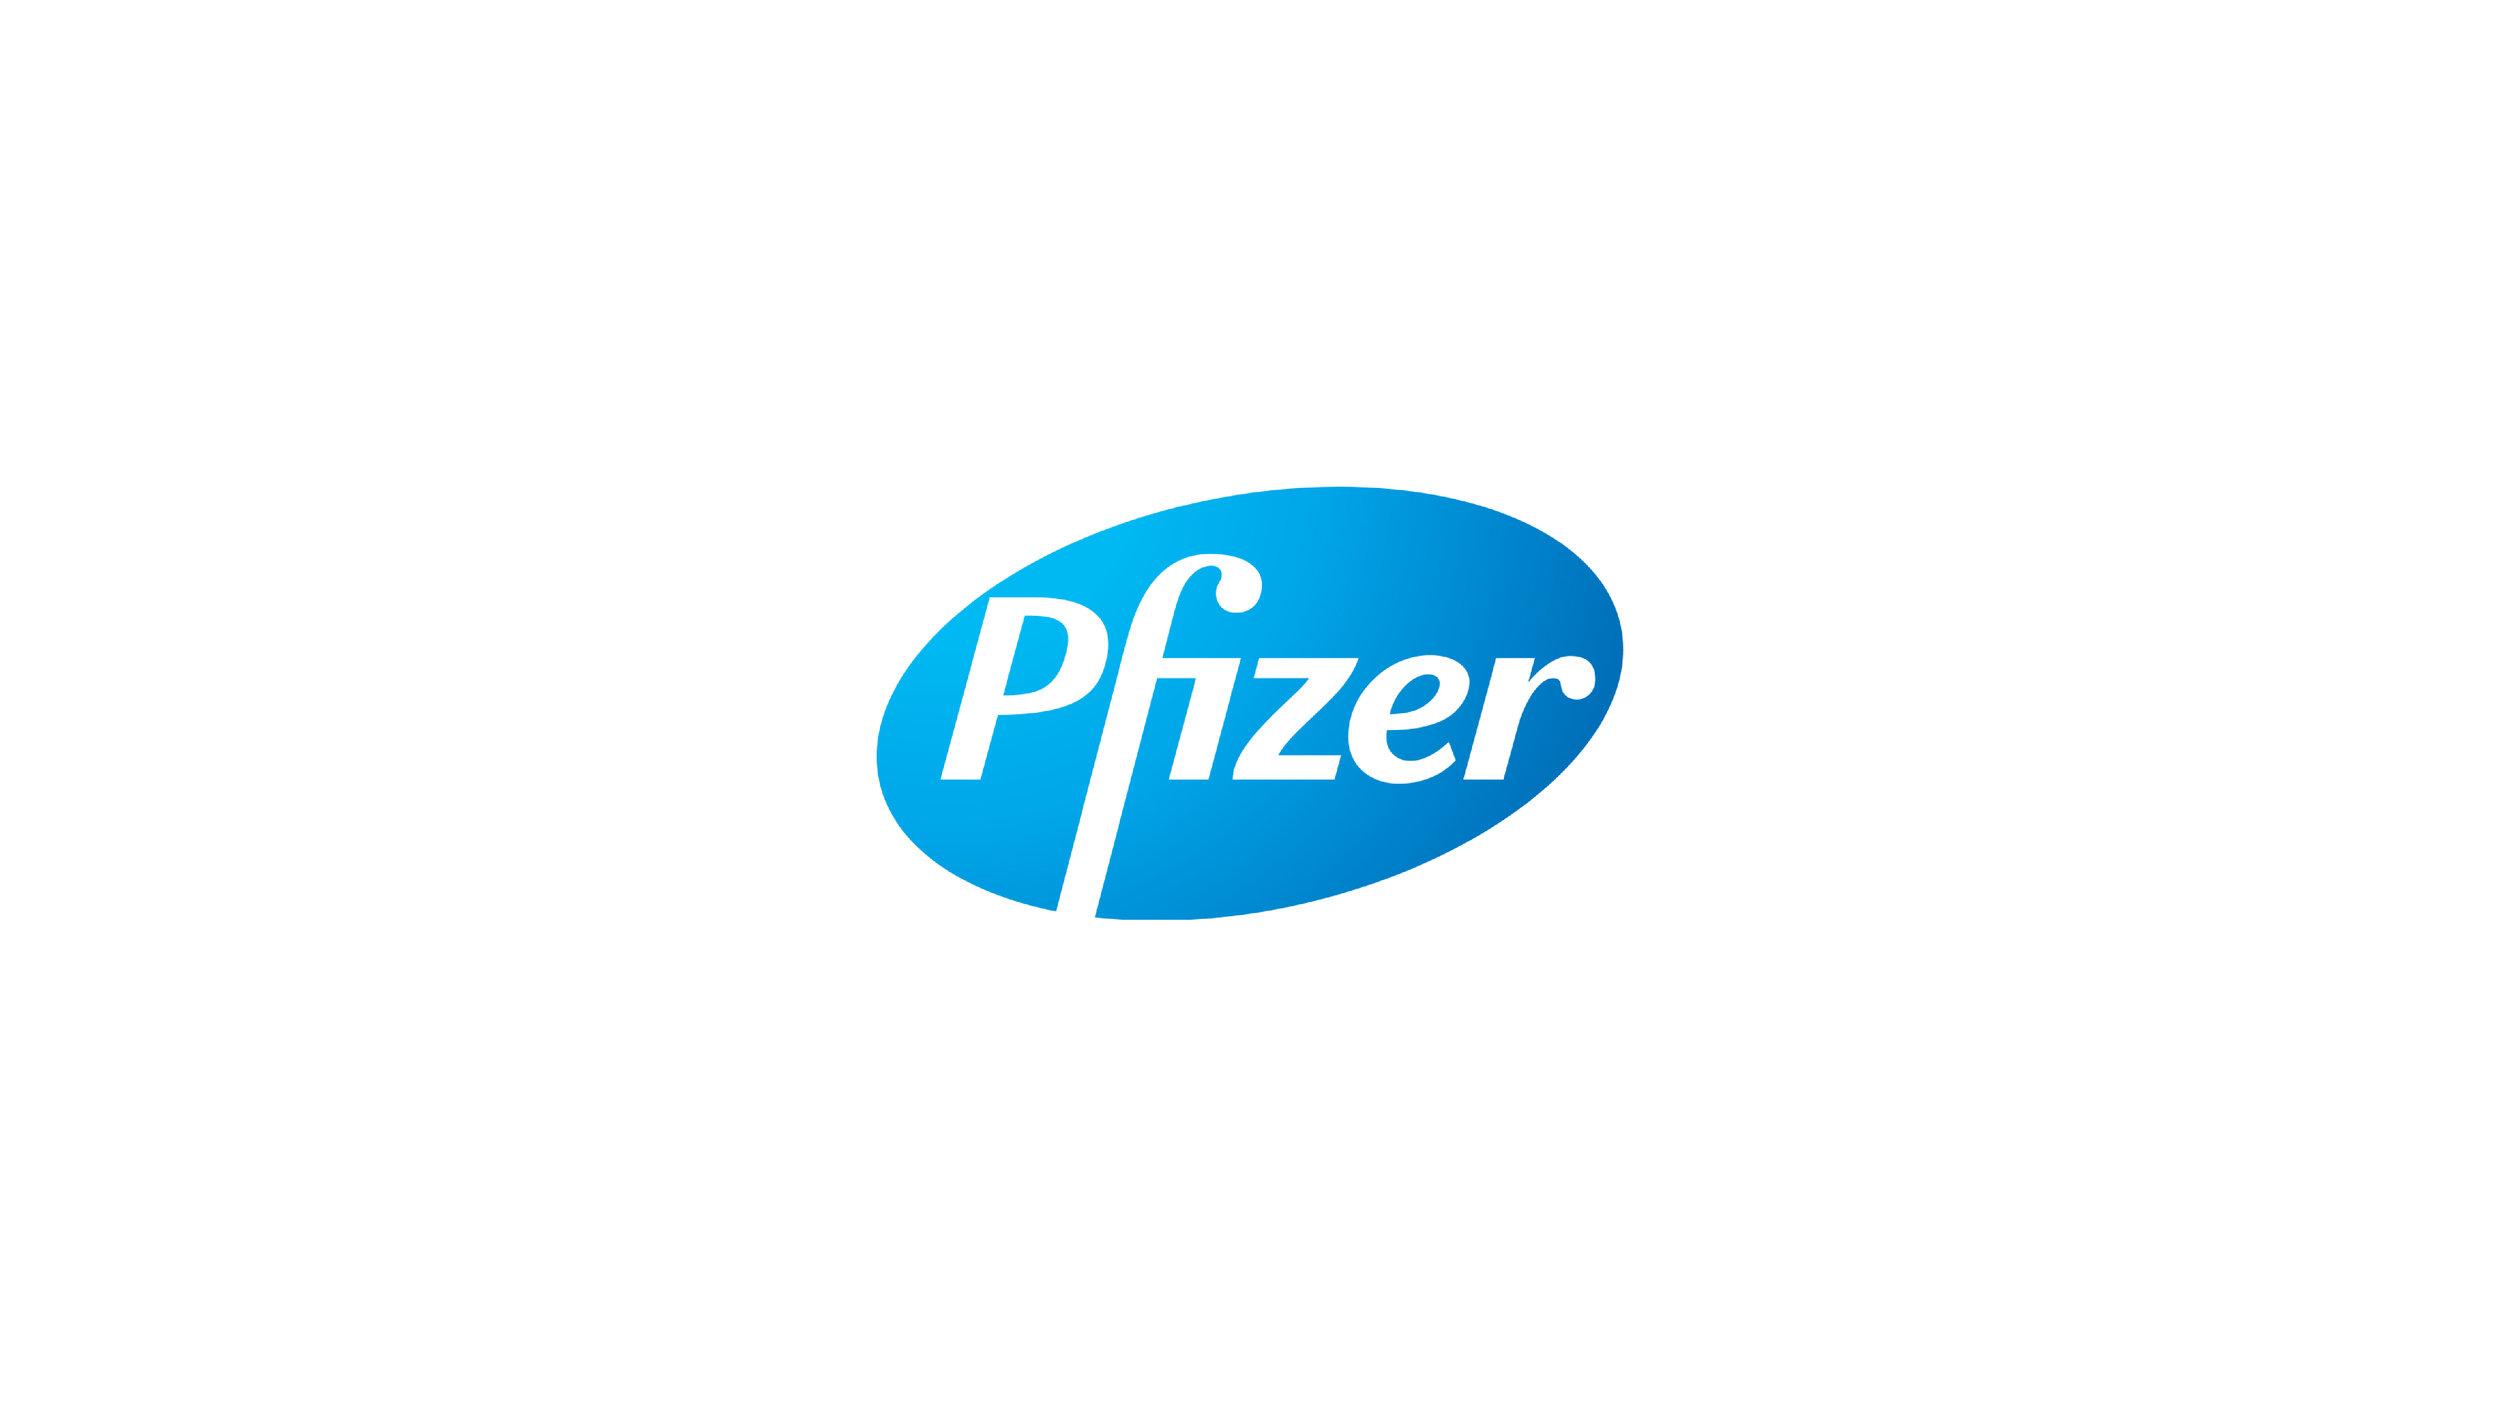 pfizer-logo-byysr